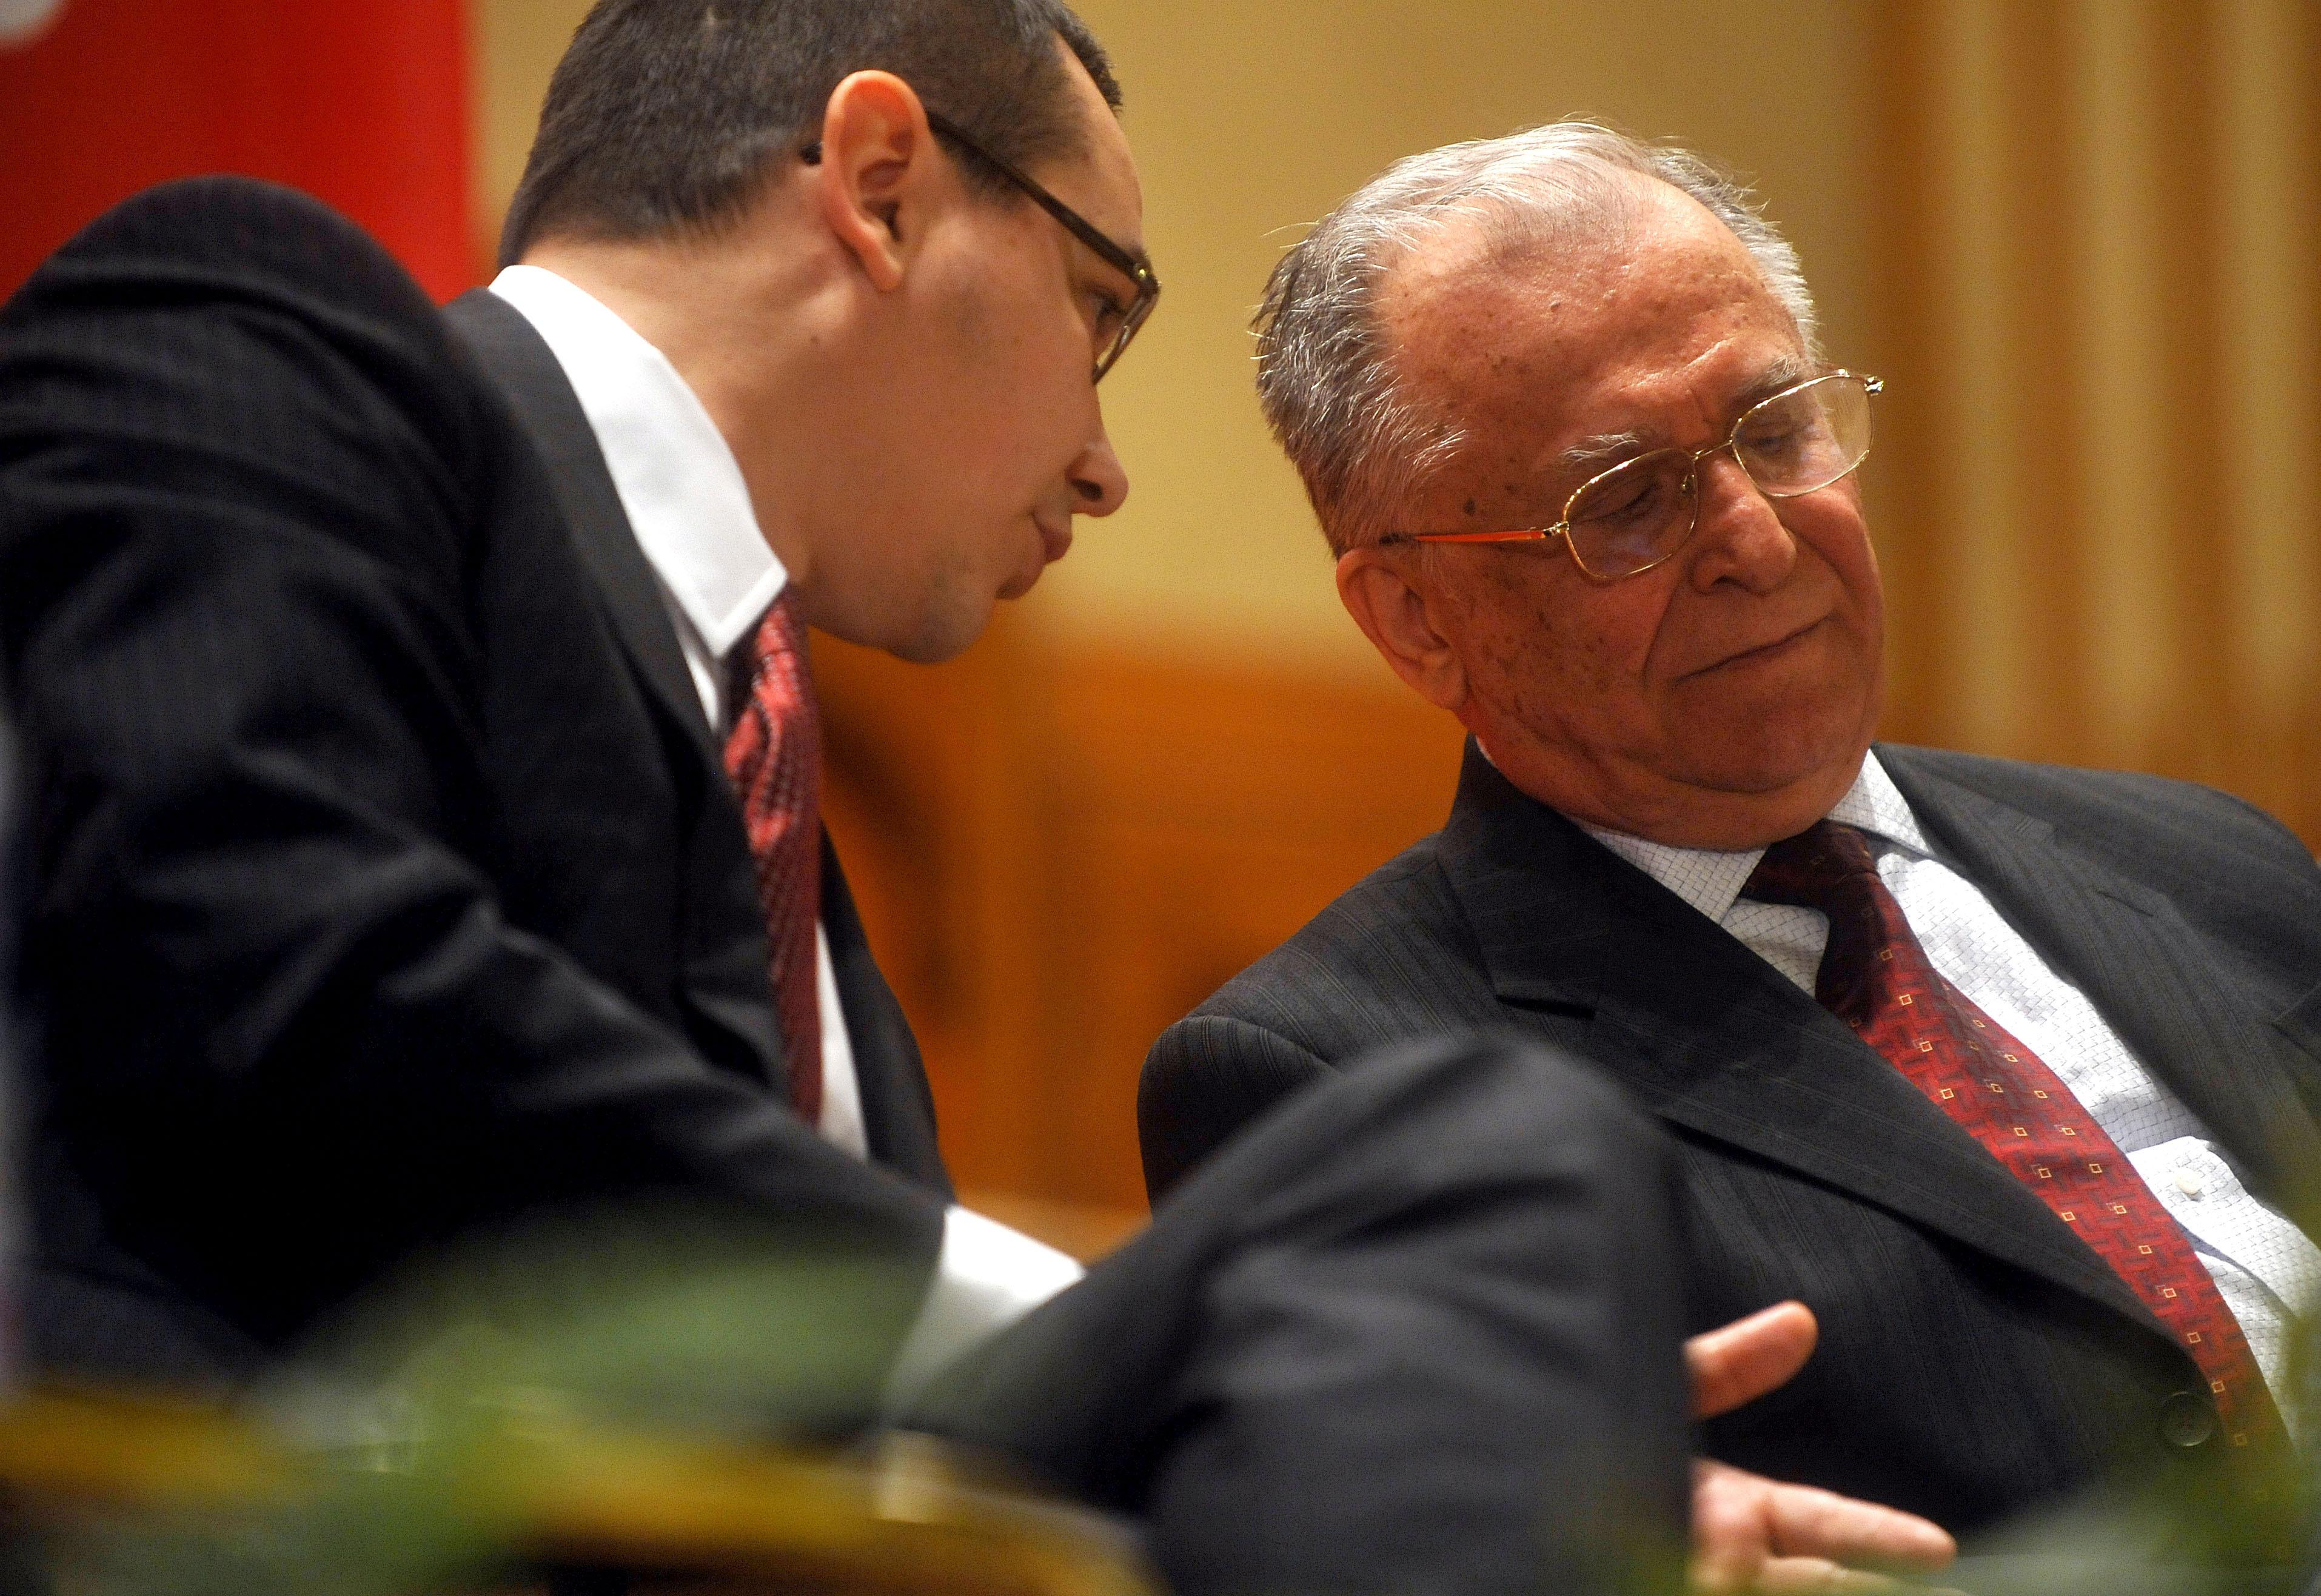 Iliescu si Pontaghita au pornit razboiul sfarsitului PSD: ,,Daca vom continua pe drumul asta, ESECUL NU E DEPARTE